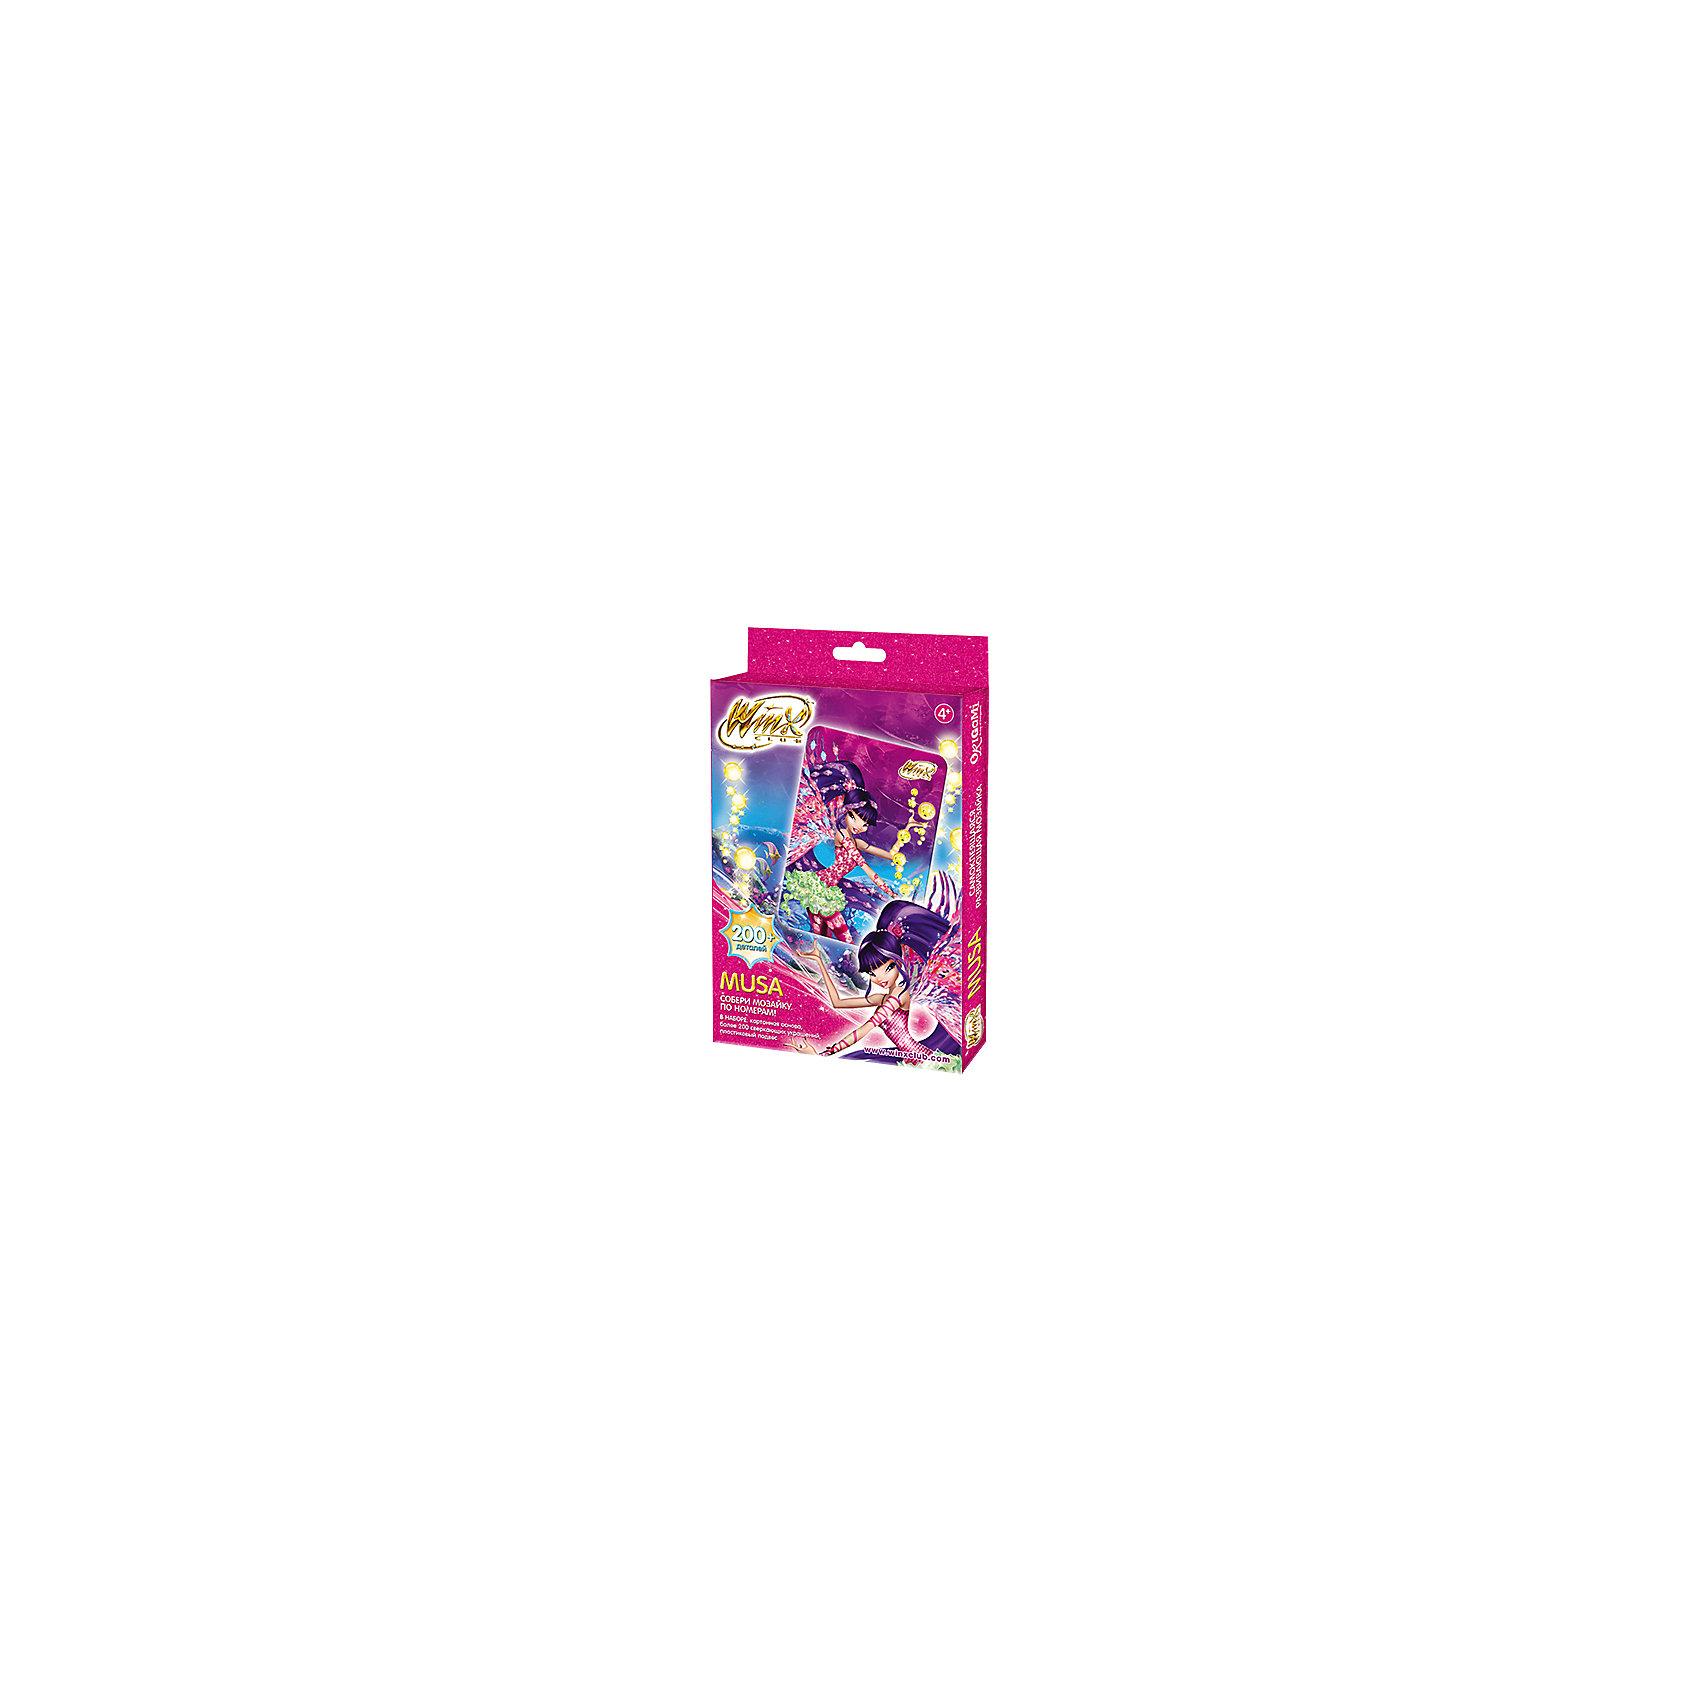 Origami Самоклеющаяся мозаика Муза, Winx Club luxury designer women handbags leather crossbody bags famous brands michael handbag fashion diamonds pearl bag sac a main femme